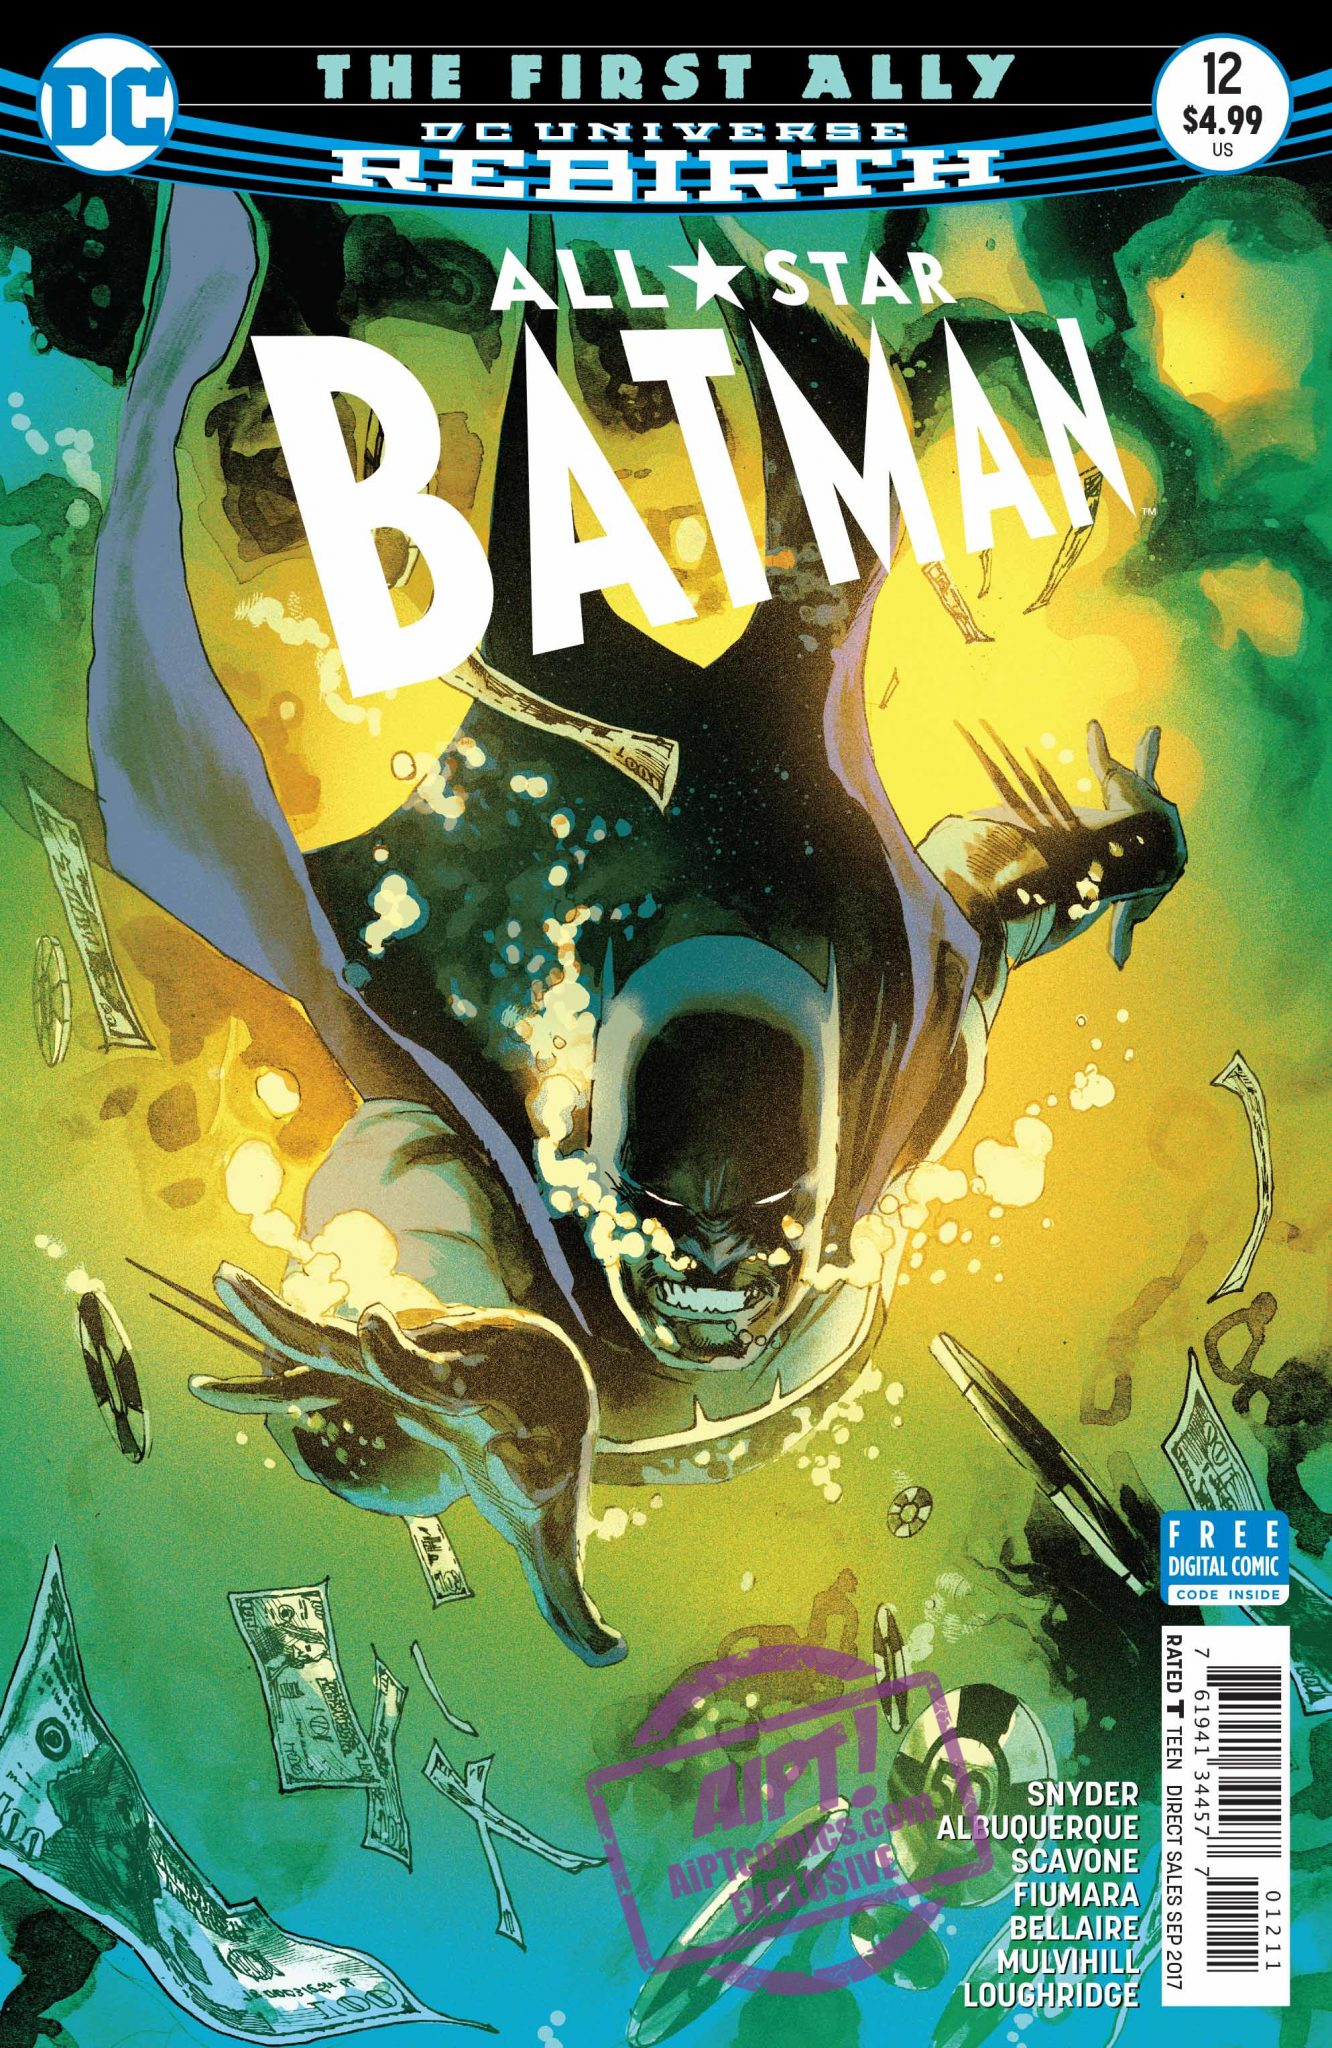 All-Star Batman #12 Review